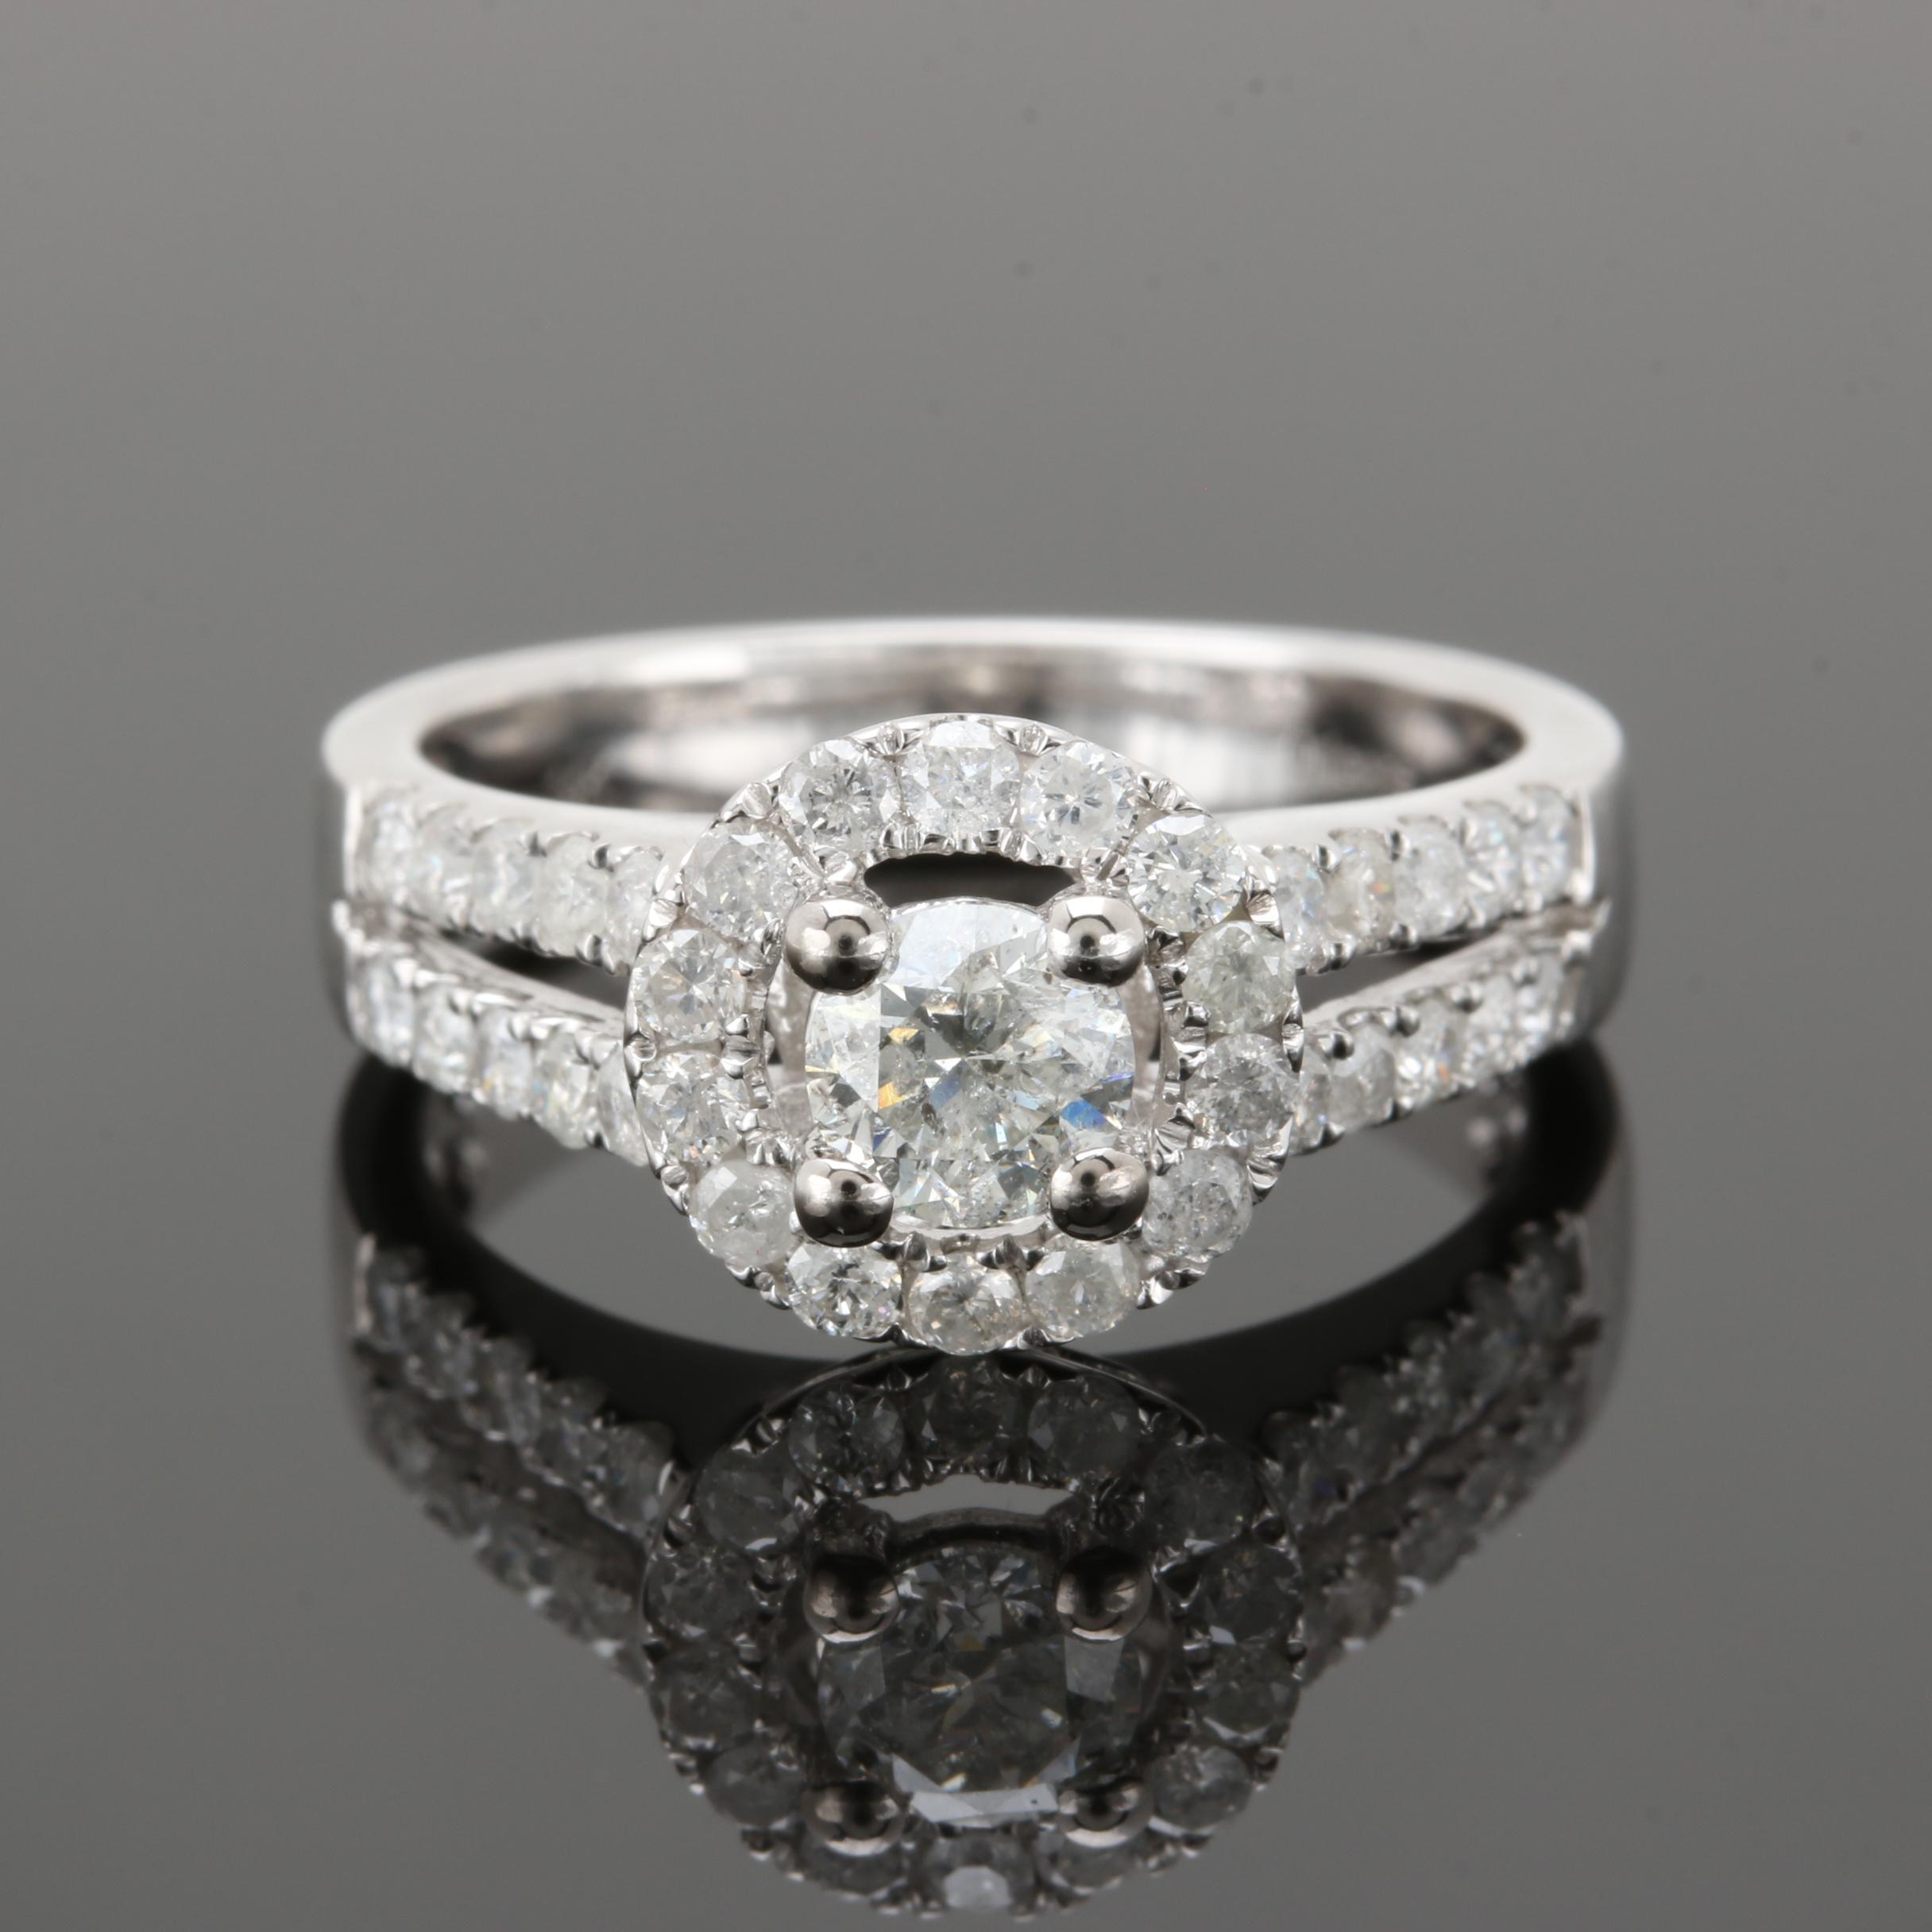 14K White Gold 1.17 CTW Diamond Ring